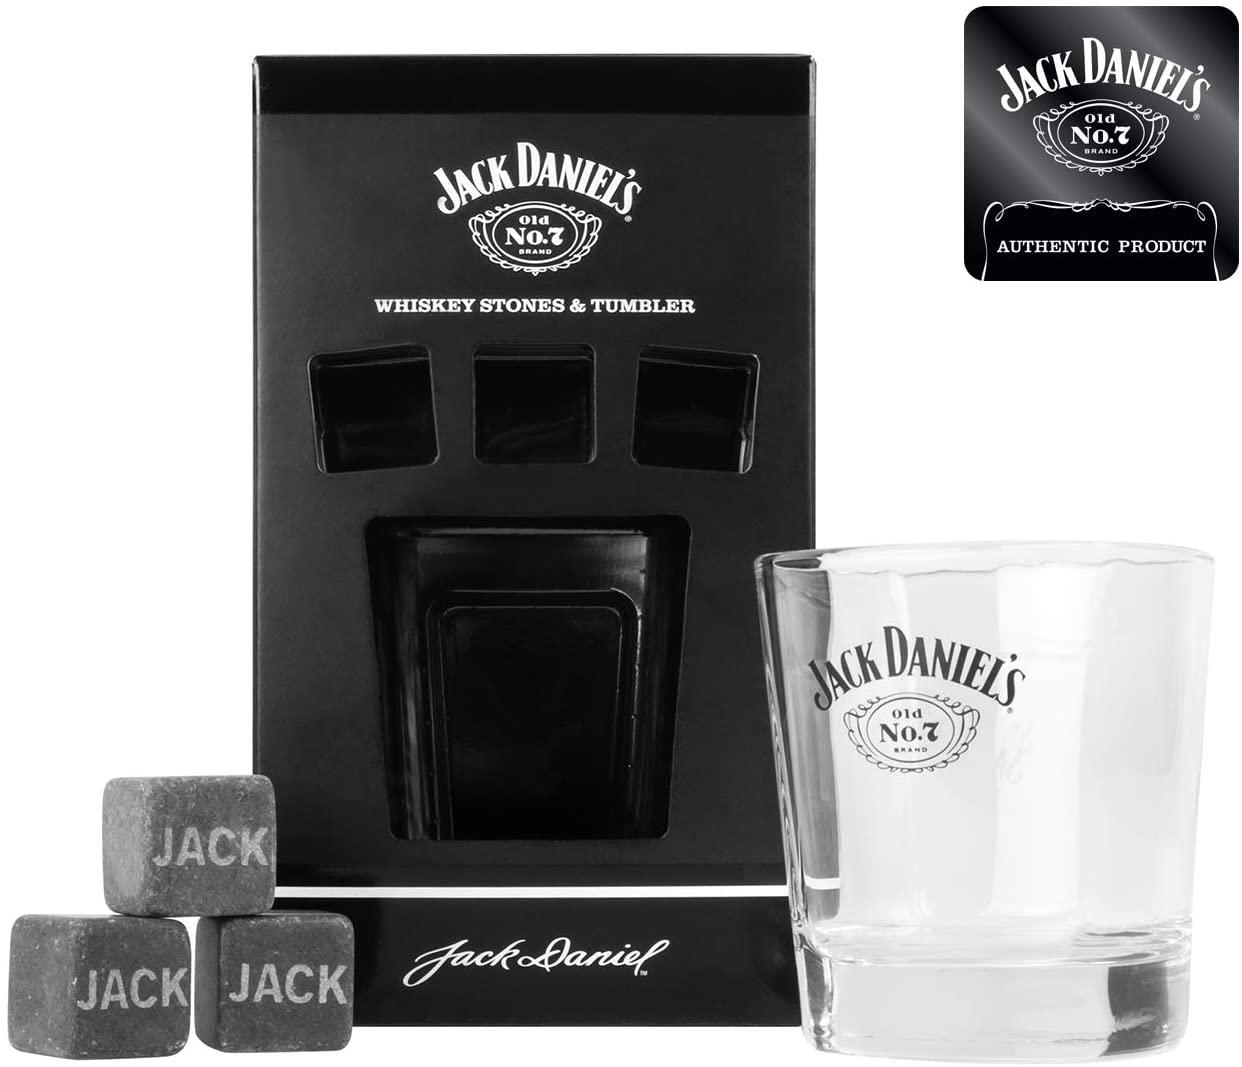 Jack Daniel's Whisky Glass Tumbler and 3 x Whisky Stones £5.61 (Prime) + £4.49 (non Prime) at Amazon